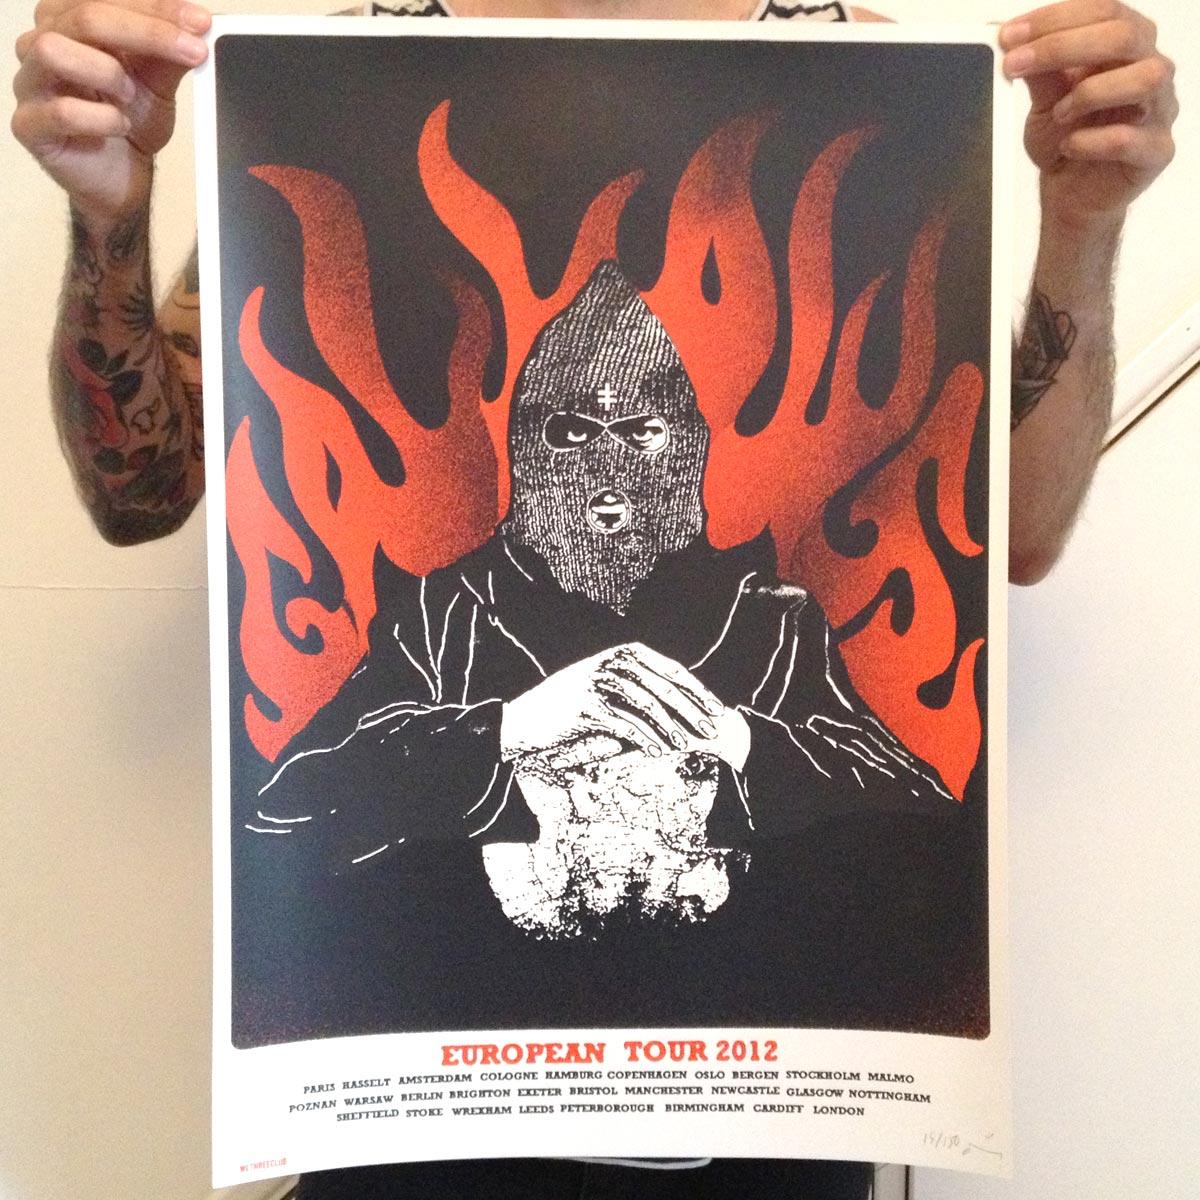 European Tour 2012 - Gallows - Screen Print Poster - Venn Records